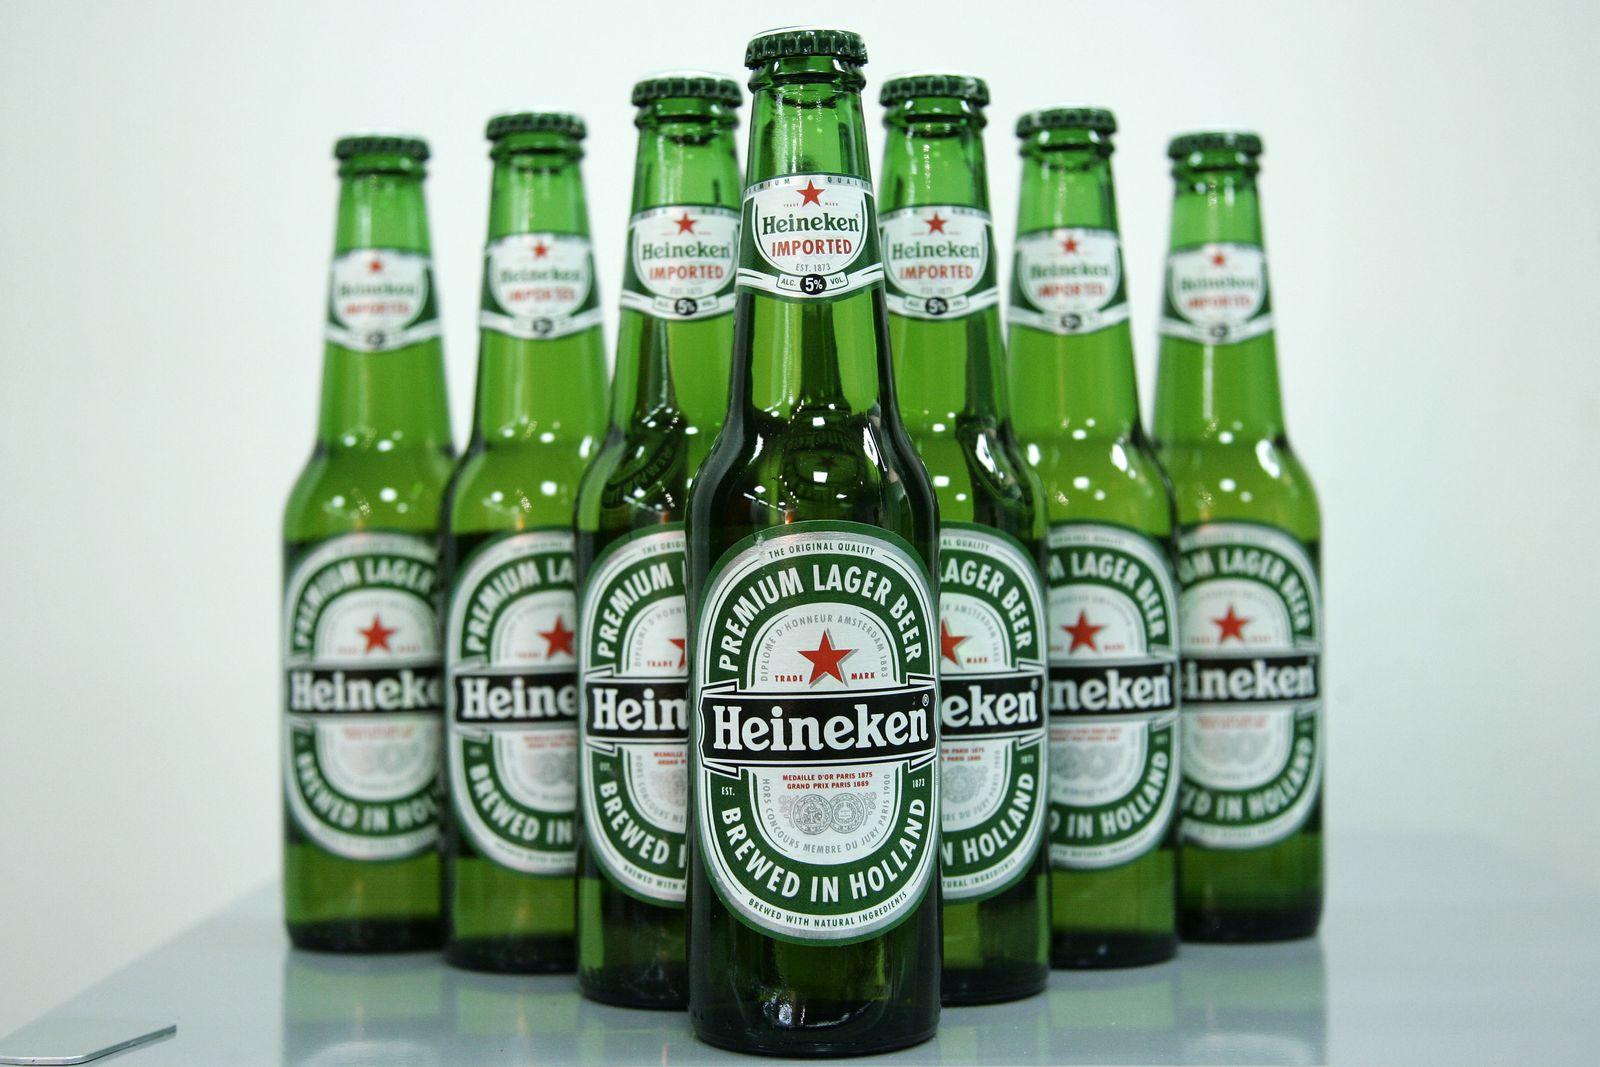 Heineken Carlsberg Bier